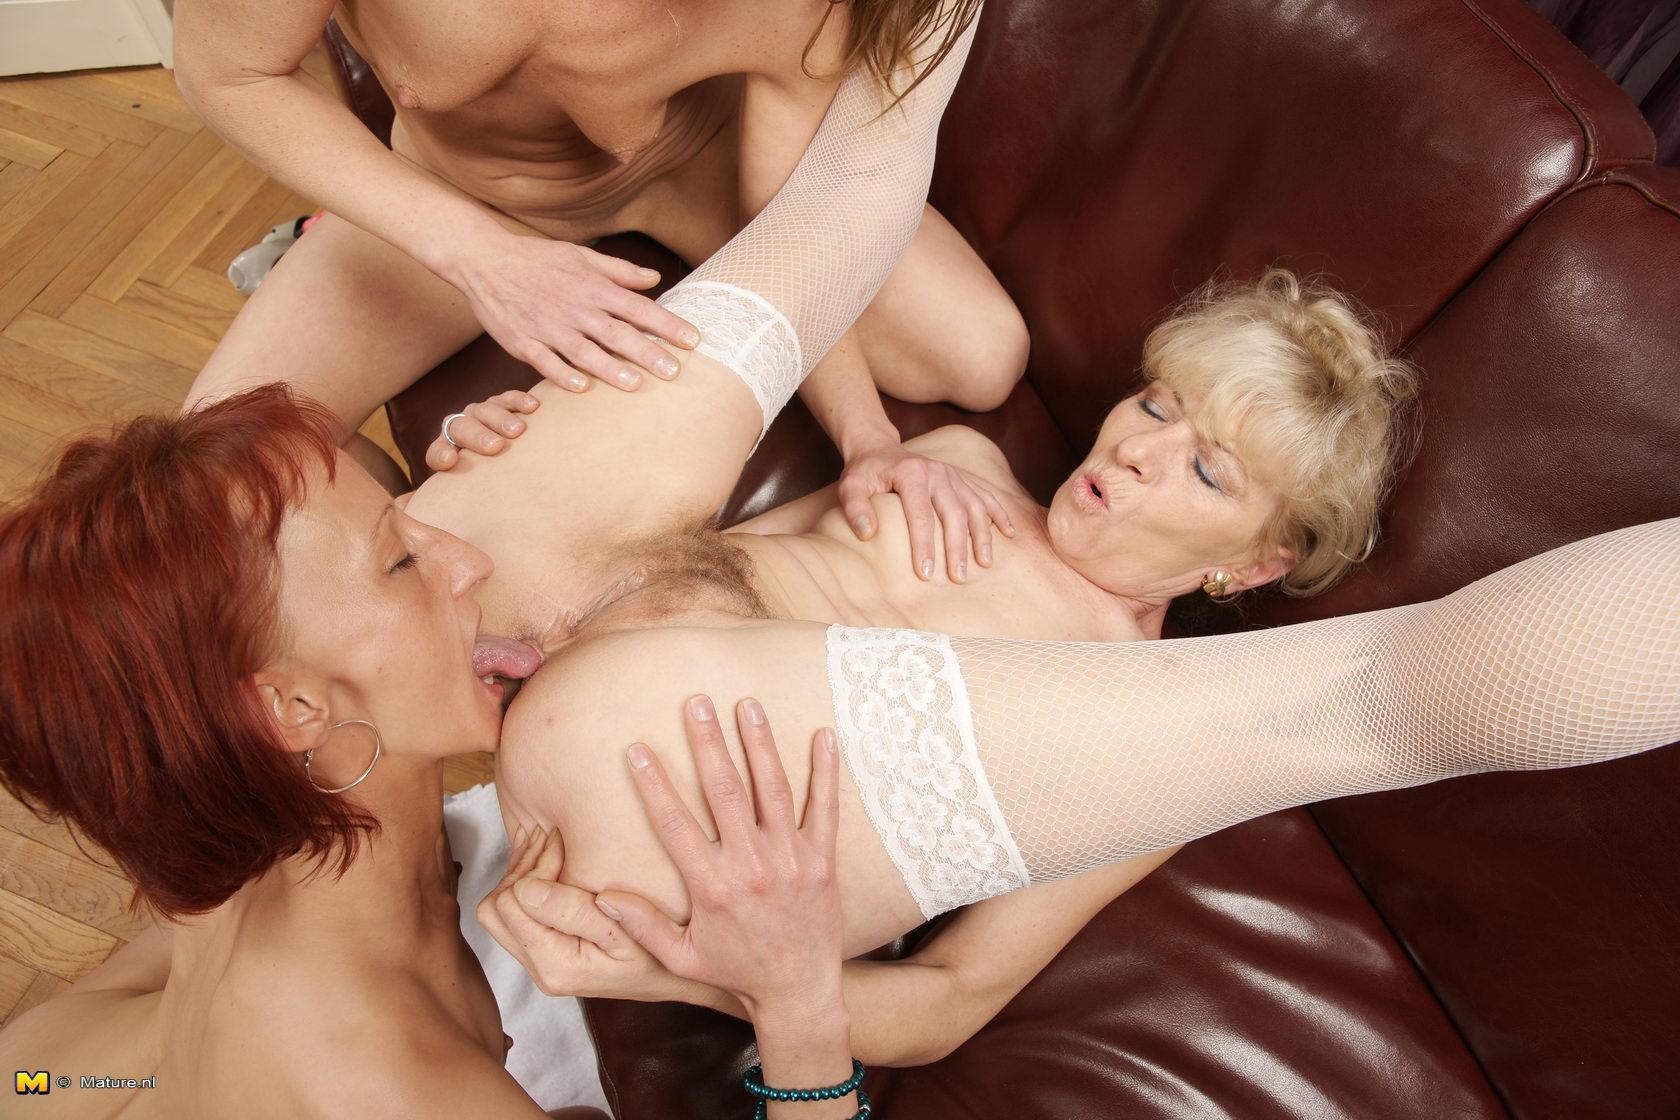 Mature women lesbian 27 фотография